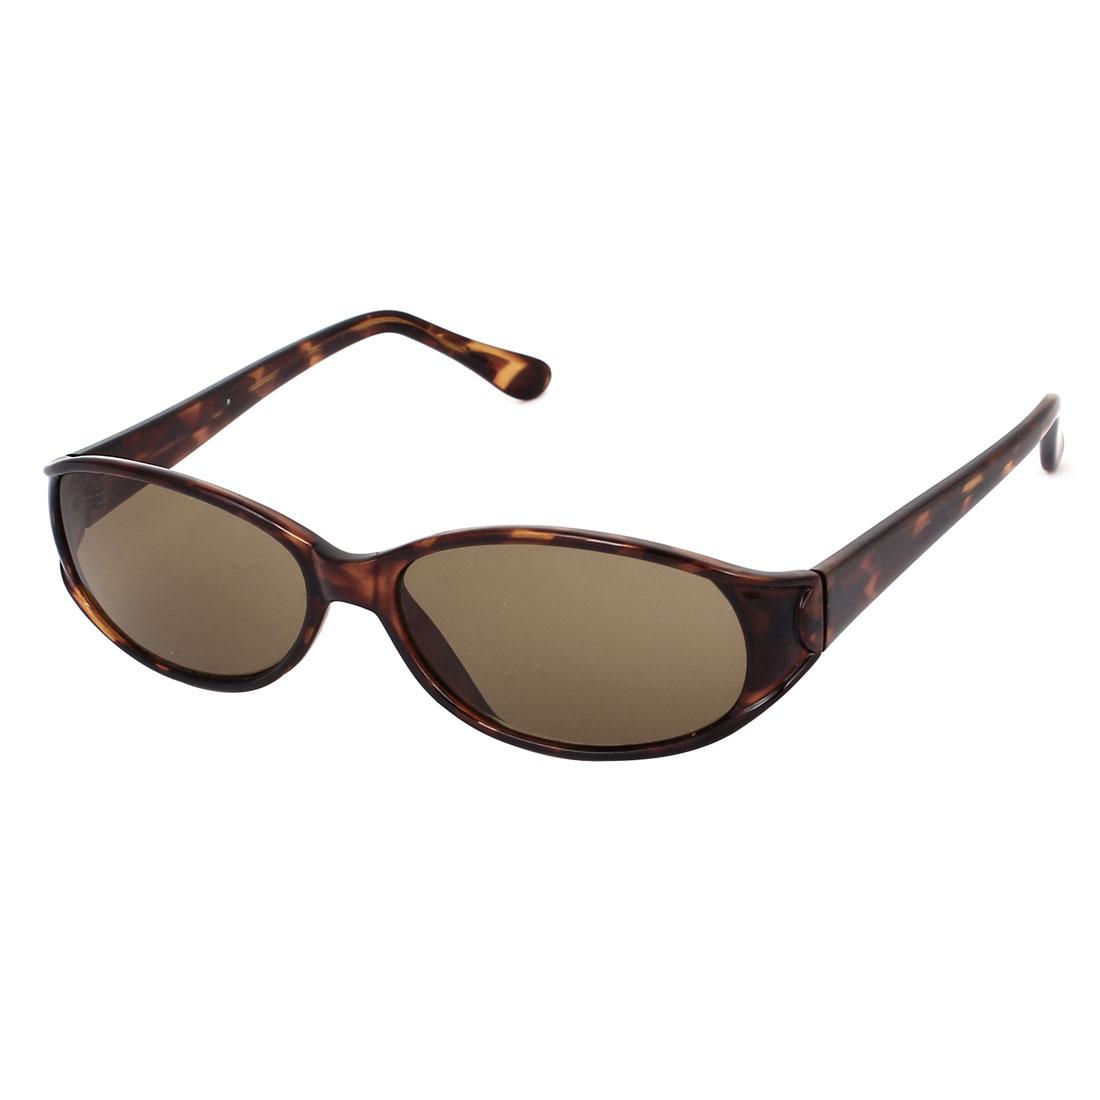 Lady Leopard Pattern Plastic Full Frame Single Bridge Oval Lens Sunglasses Brown